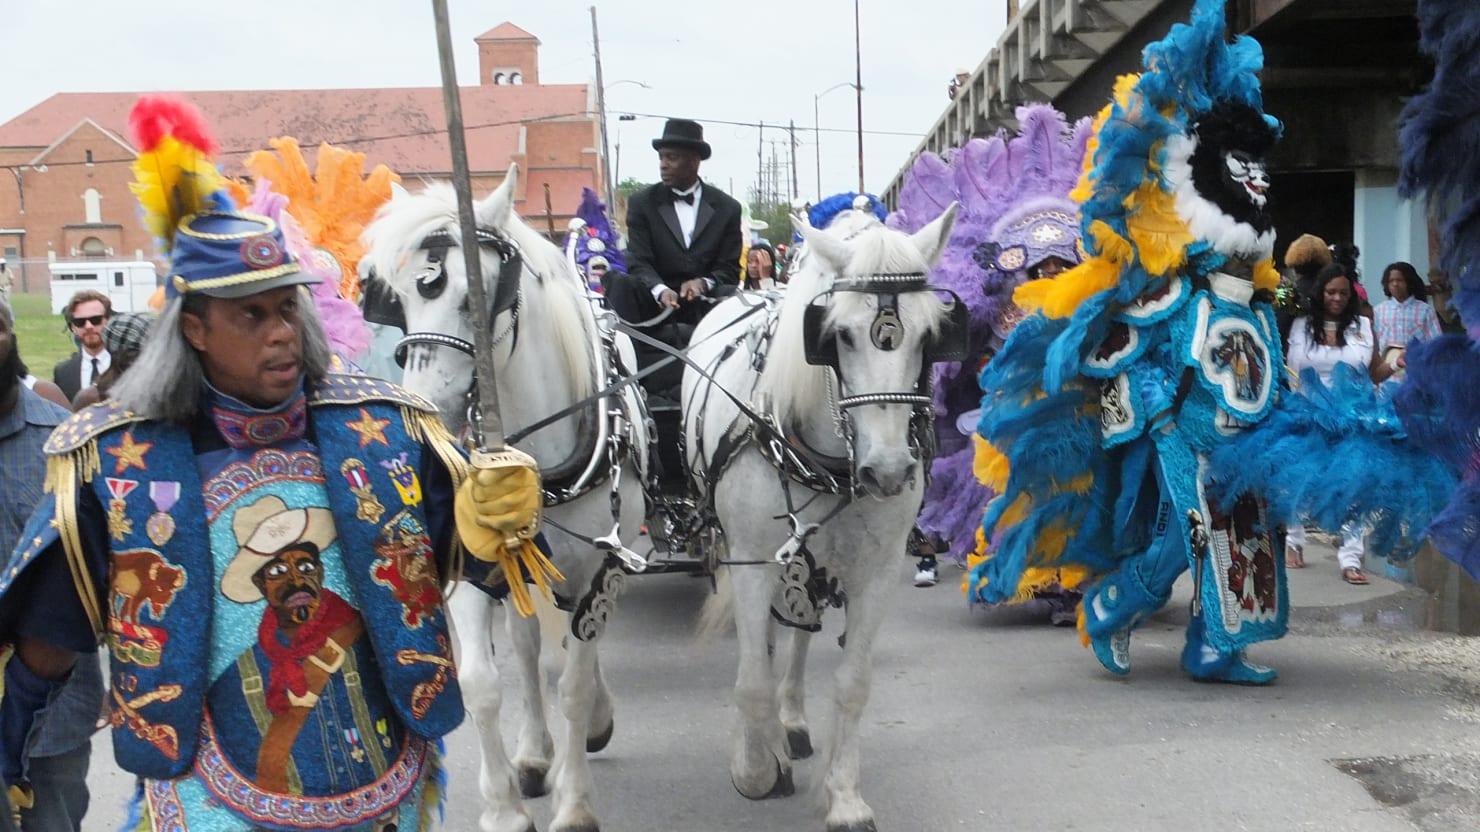 mardi gras indian chief larry bannock�s final ride